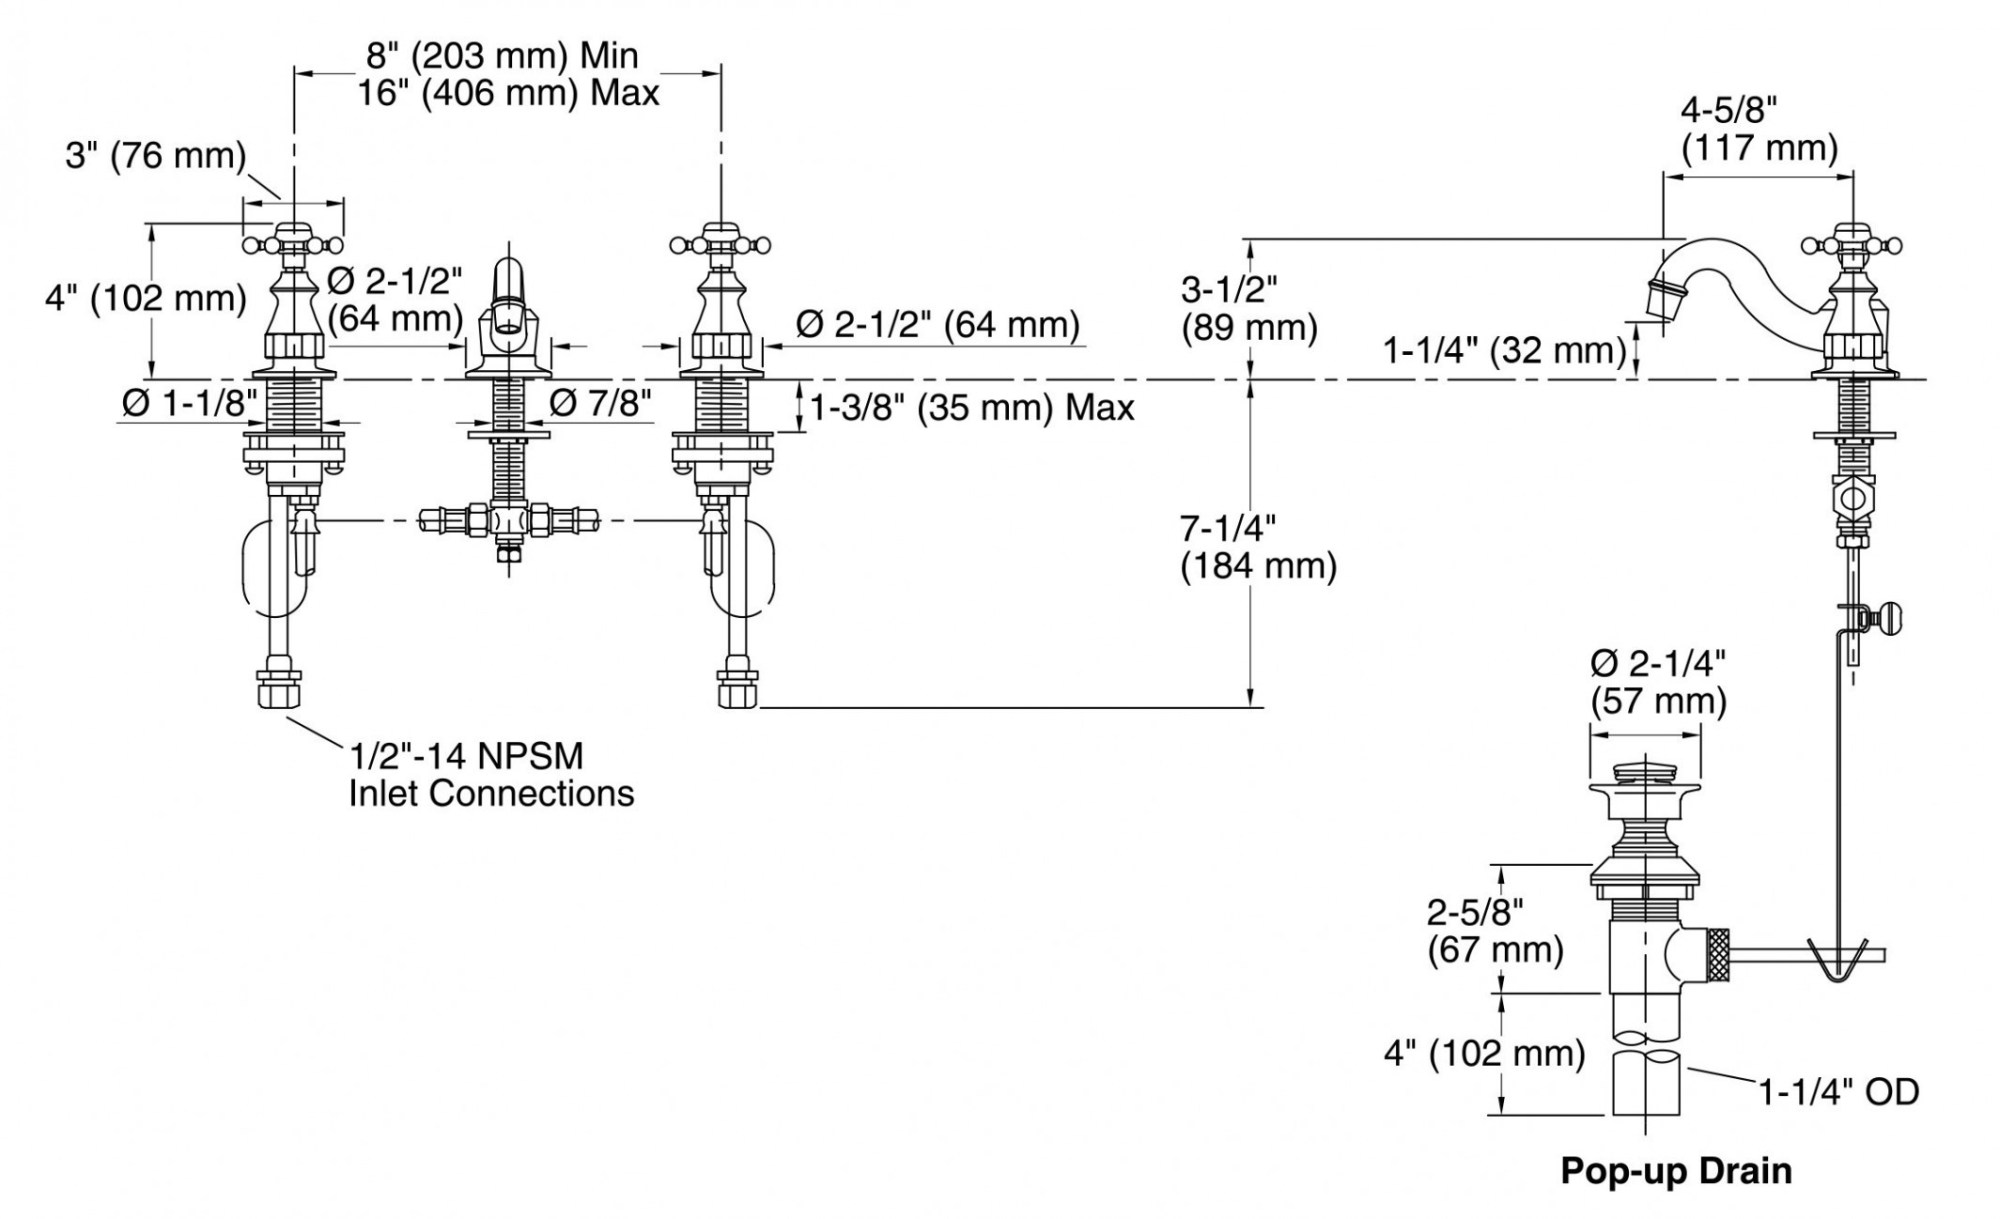 hight resolution of 7 3 engine parts diagram kohler engine parts diagram wiring diagram for kohler engine valid